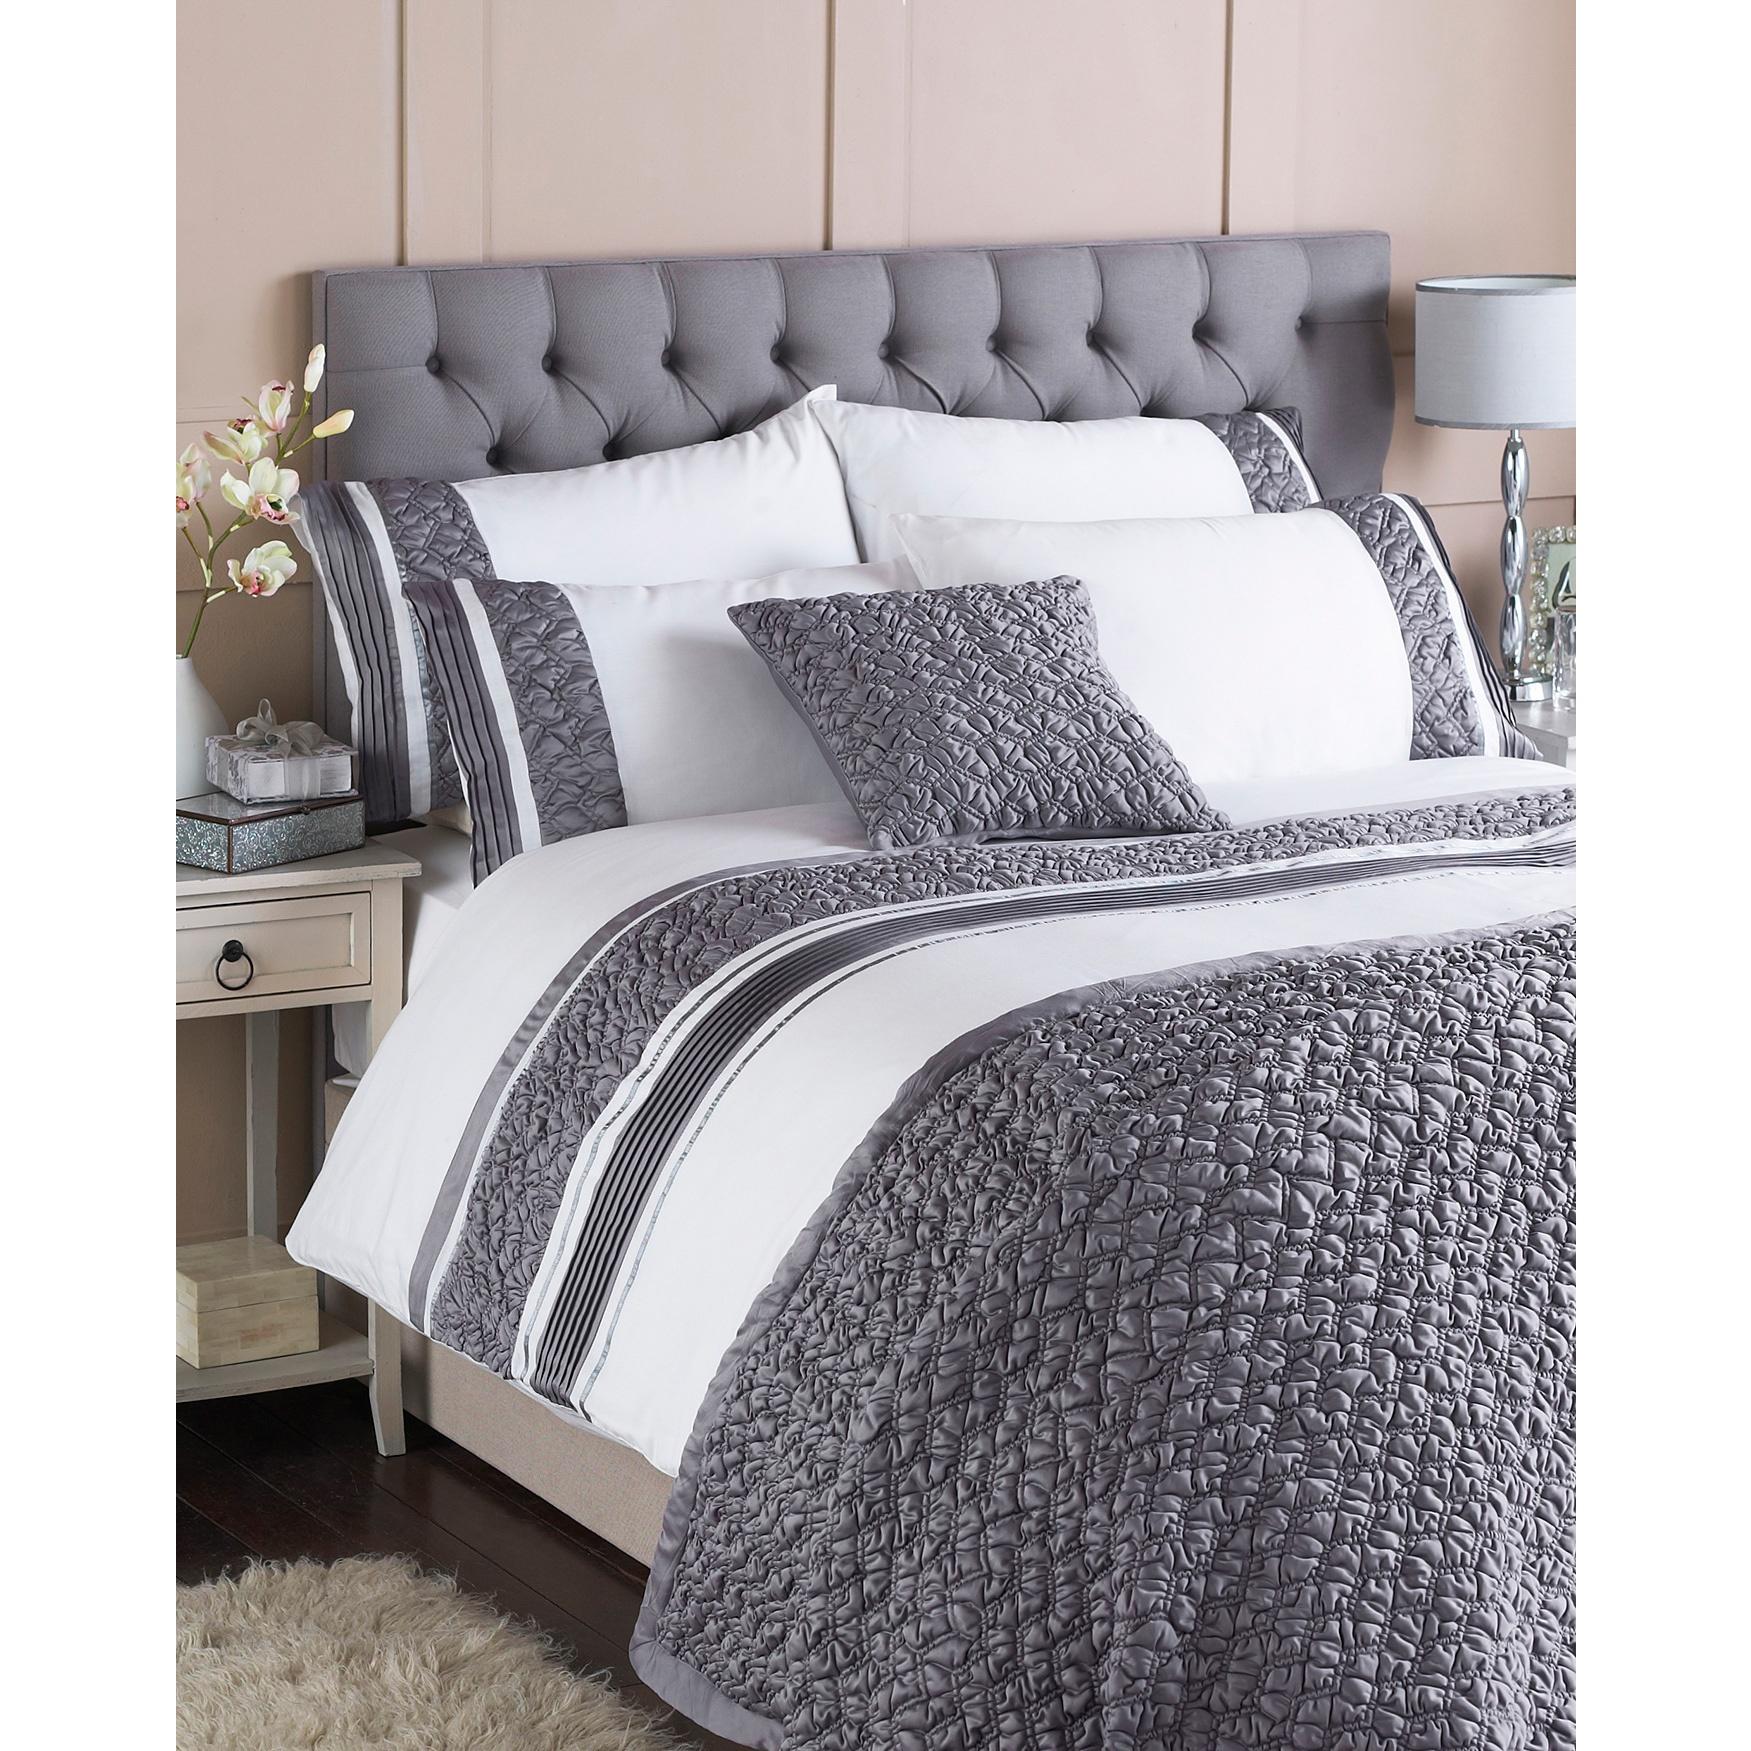 Riva Home Macy Duvet Sheet And Pillowcase Set